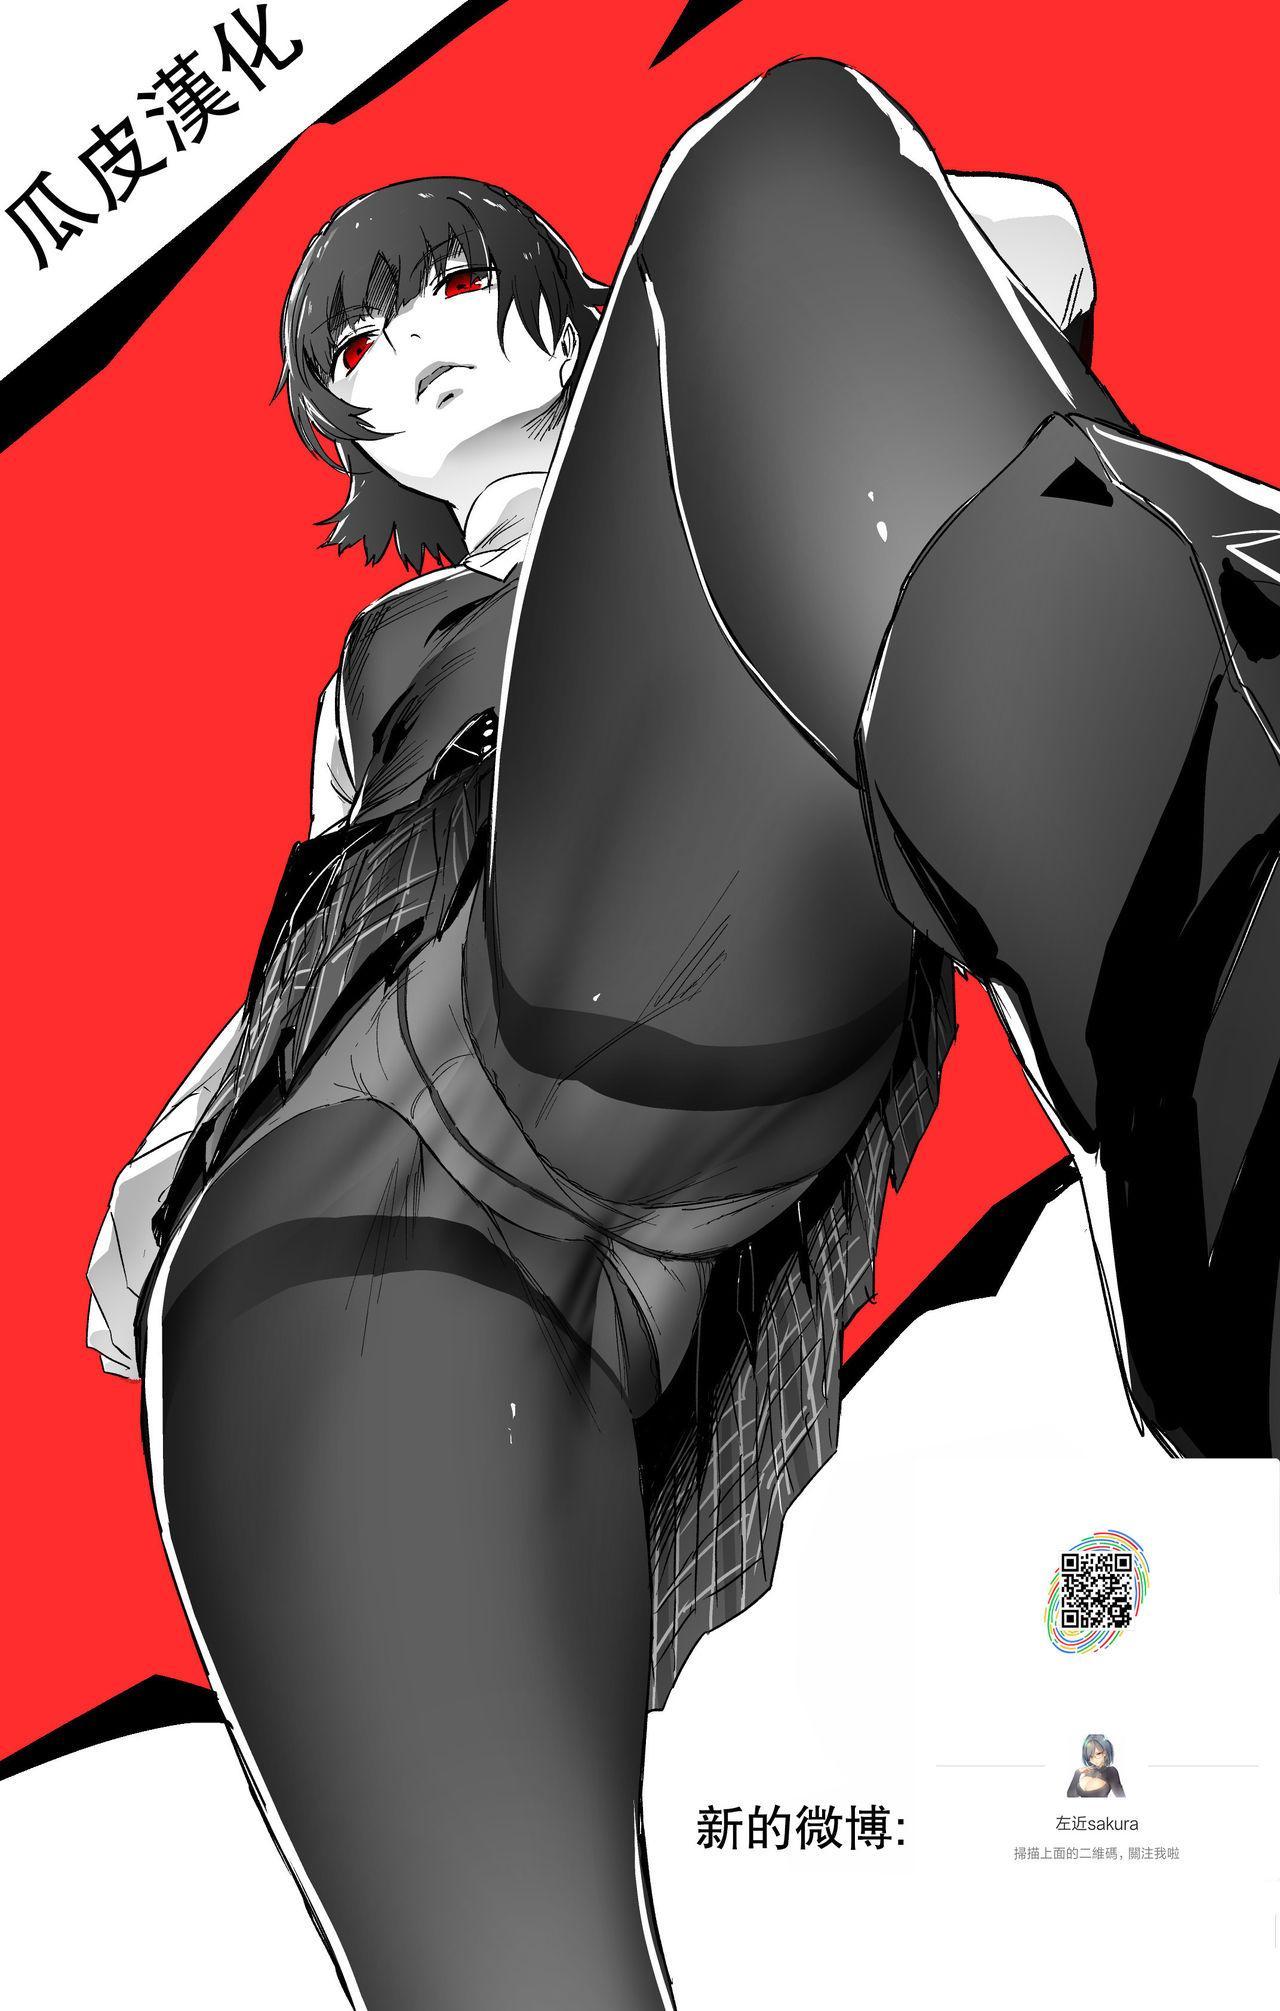 [Kurosu Gatari] Bandai-kun to Onee-san (COMIC HOTMILK 2020-08) [Chinese] [瓜皮汉化] [Digital] 24